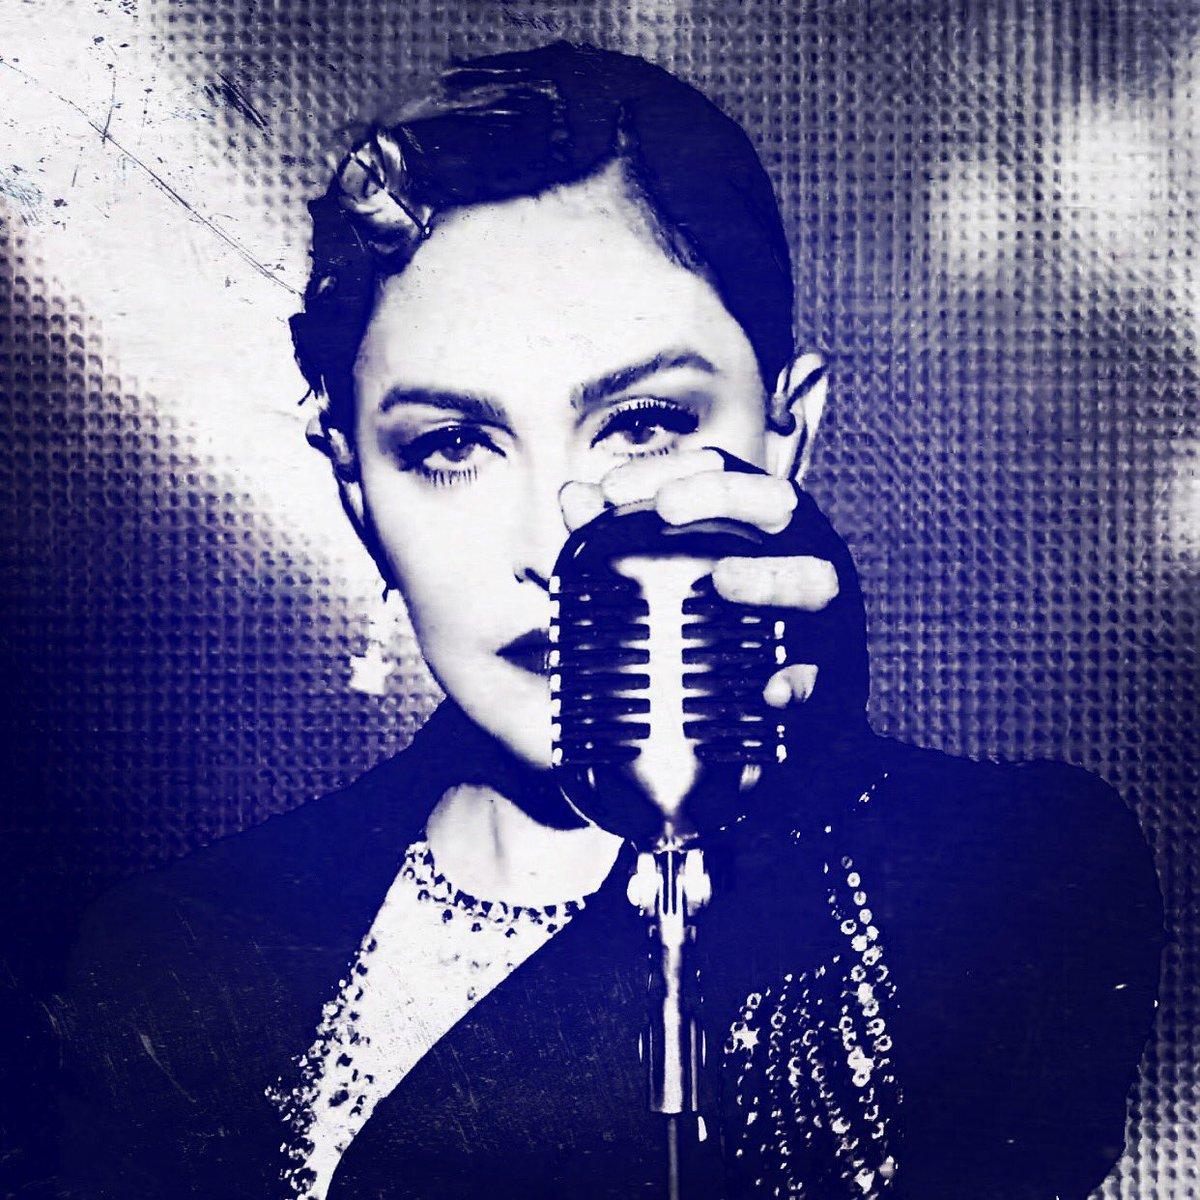 MADONNA&#39;S GONNA LIFT ME UP⬆︎⬆︎⬆︎⬆︎ : Universal Music Australia #madonna #rebelhearttour #rebelheart #bvd #bluray #cd<br>http://pic.twitter.com/FhoZYD0hoB